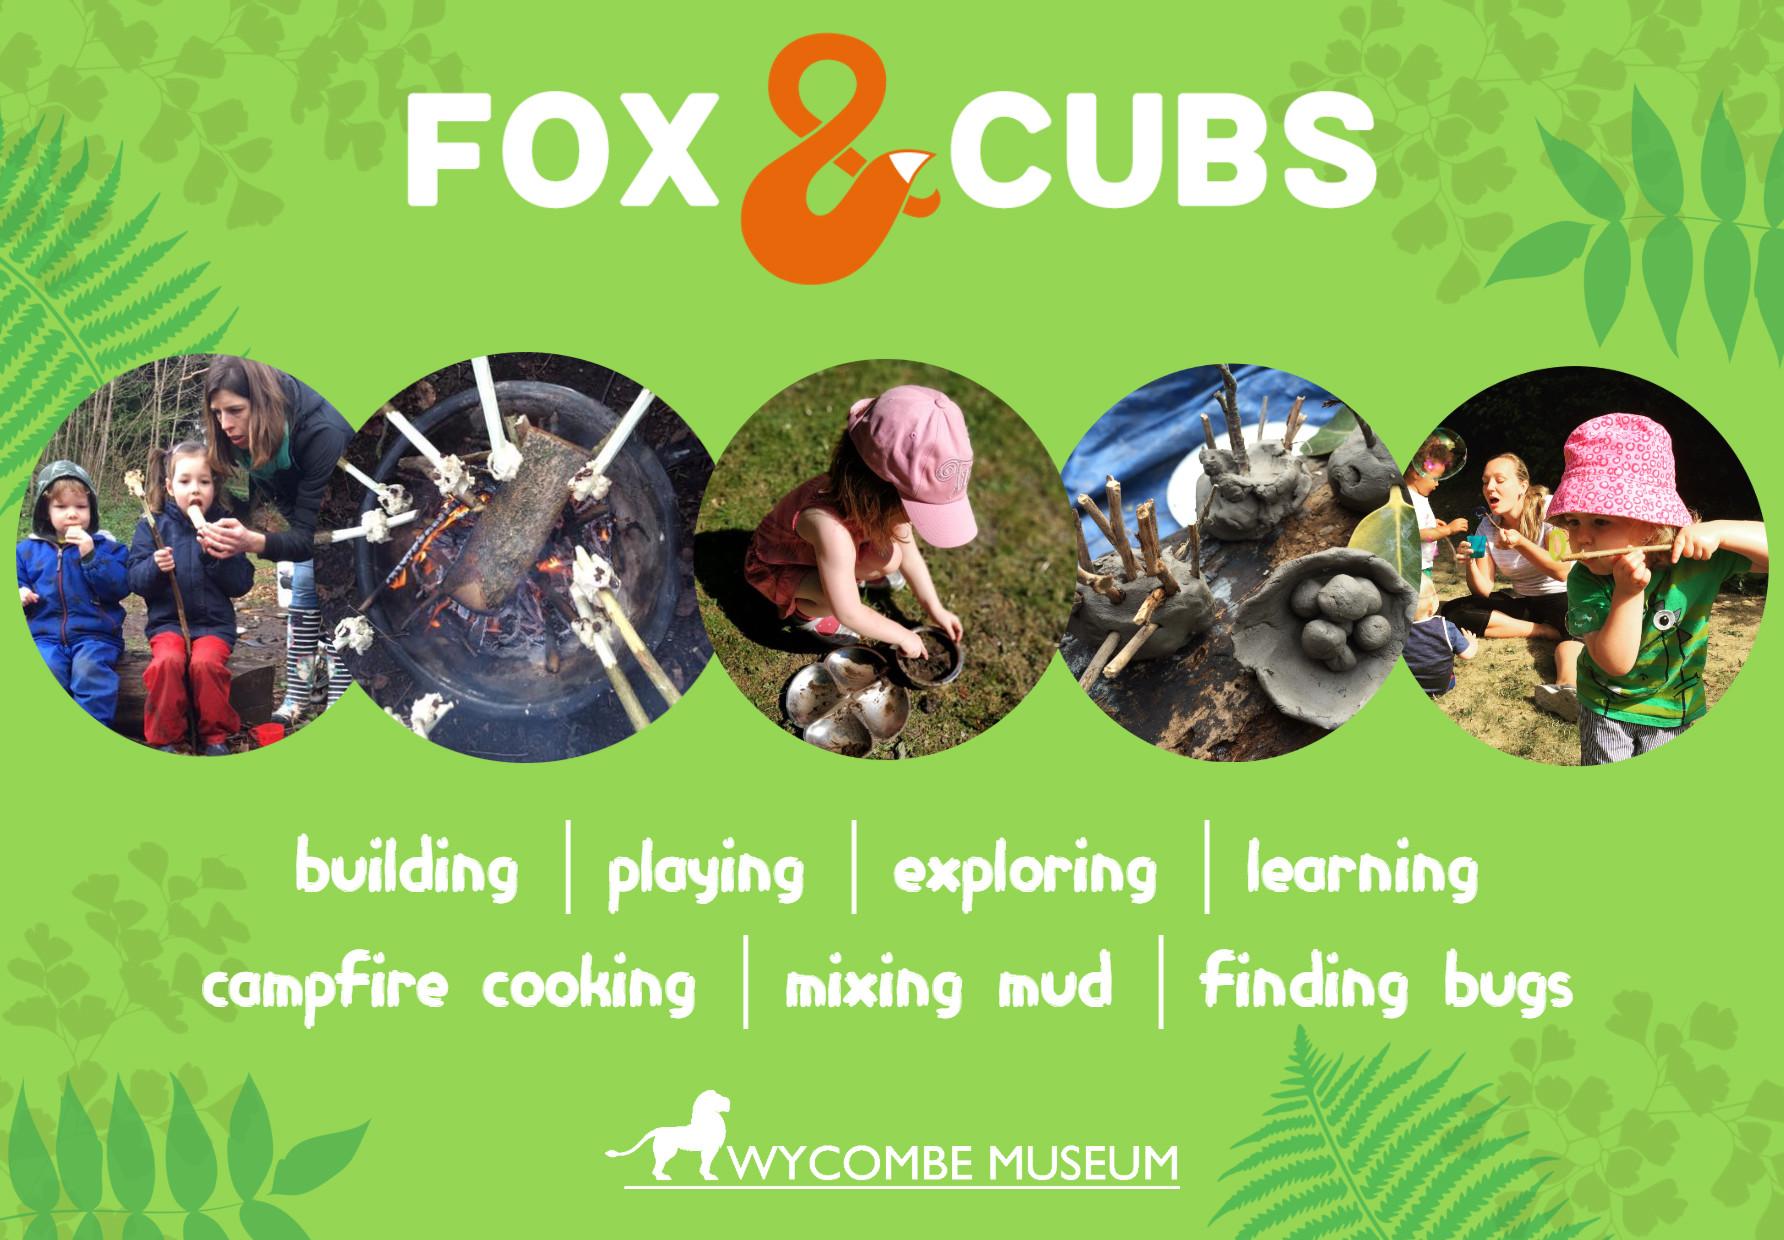 Fox & Cubs Family Fun banner image